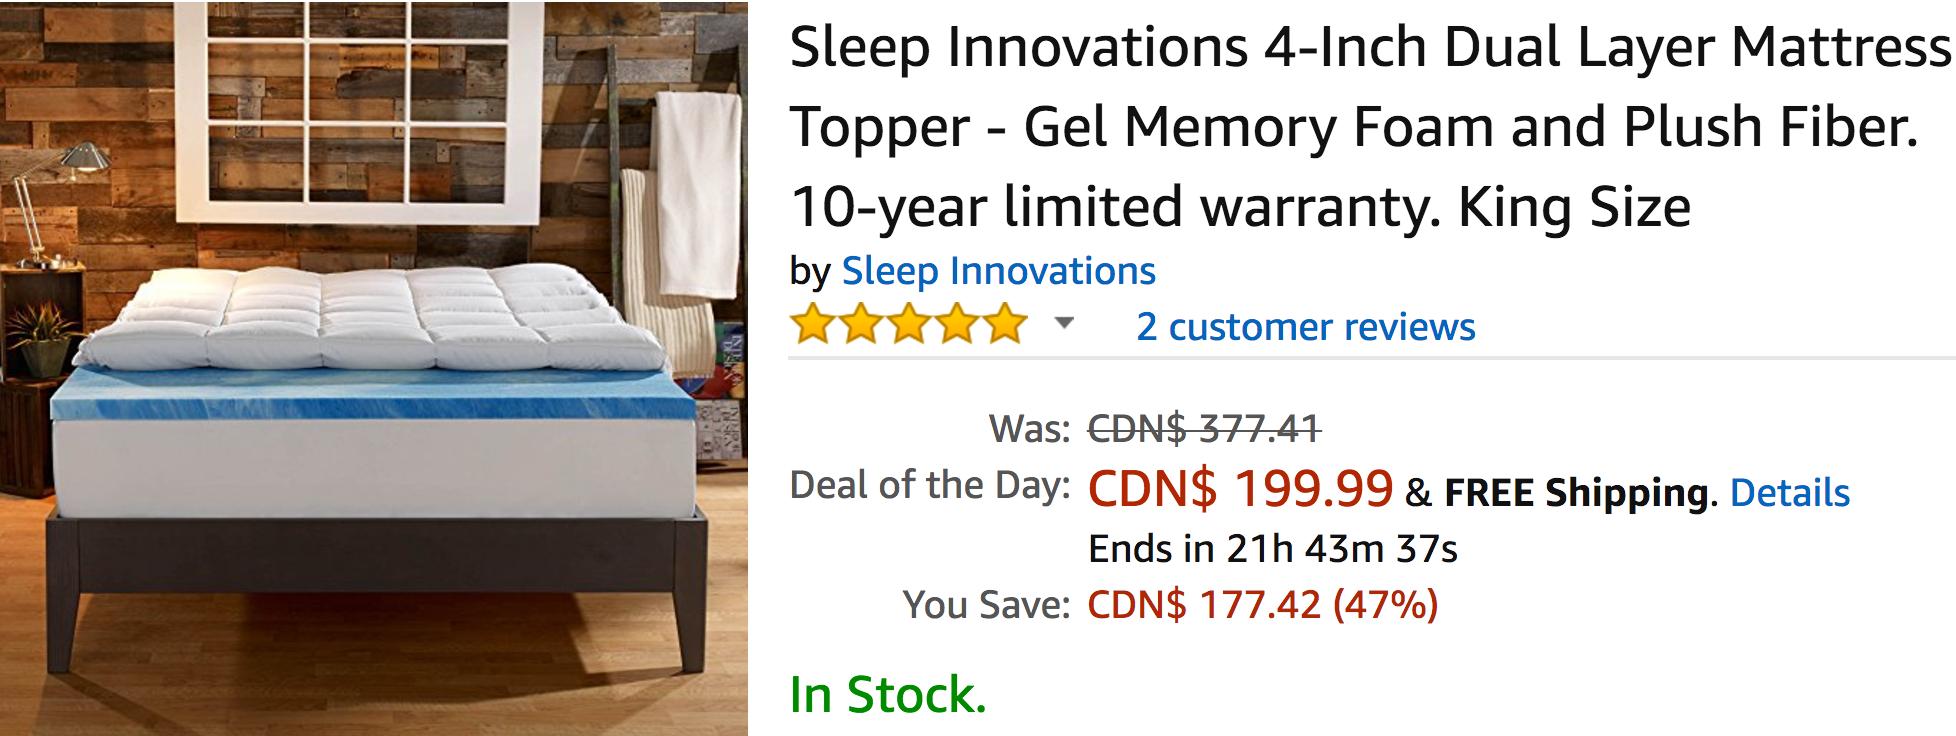 Amazon sleep innovations coupon